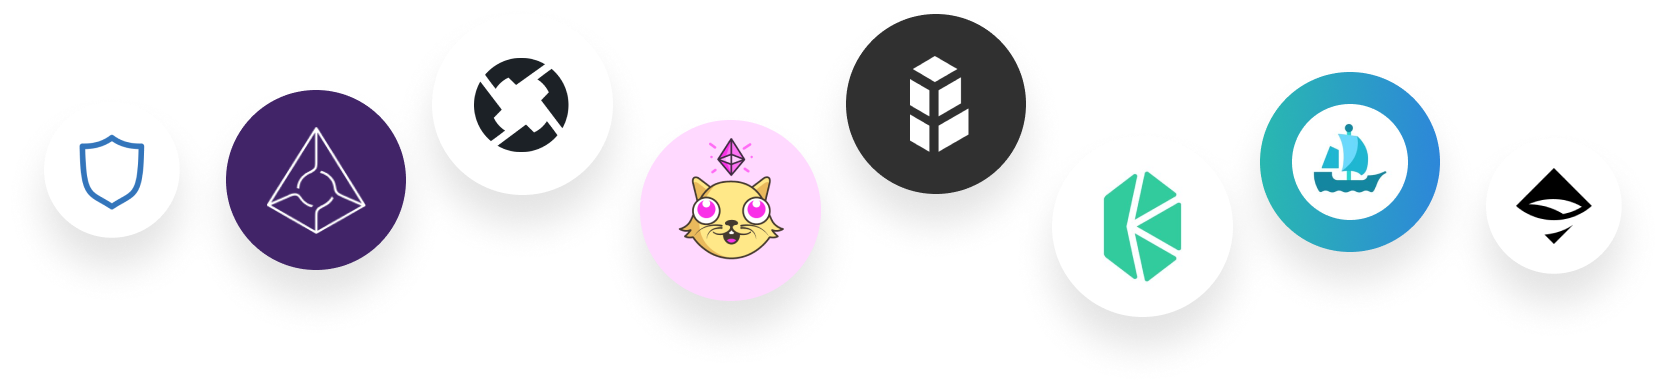 Alchemy customer logos